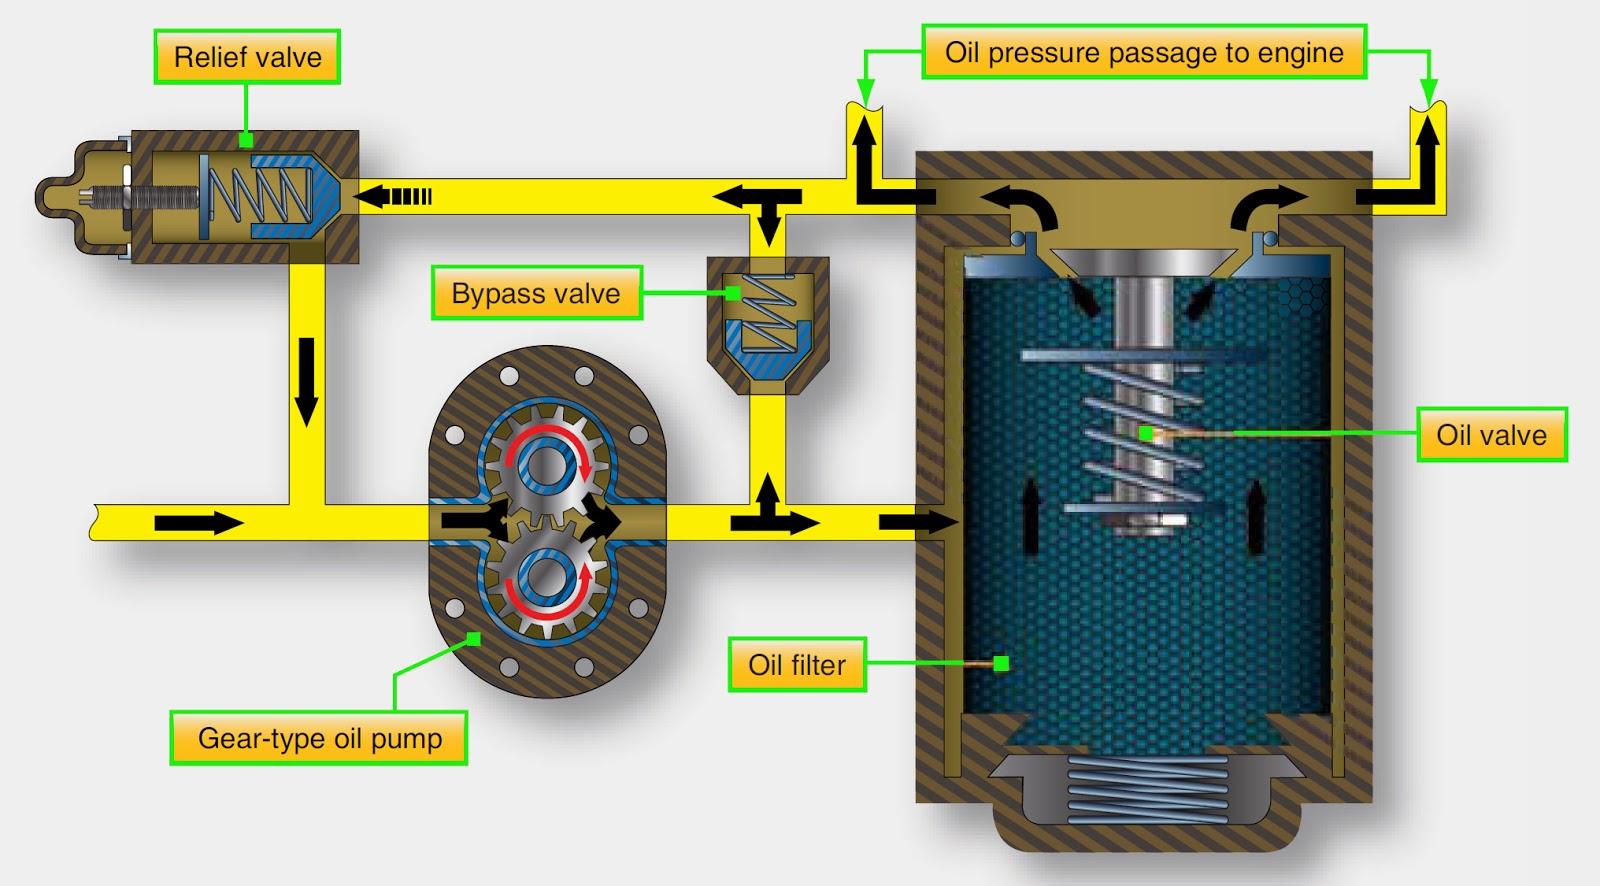 engine lubrication flow  engine  free engine image for